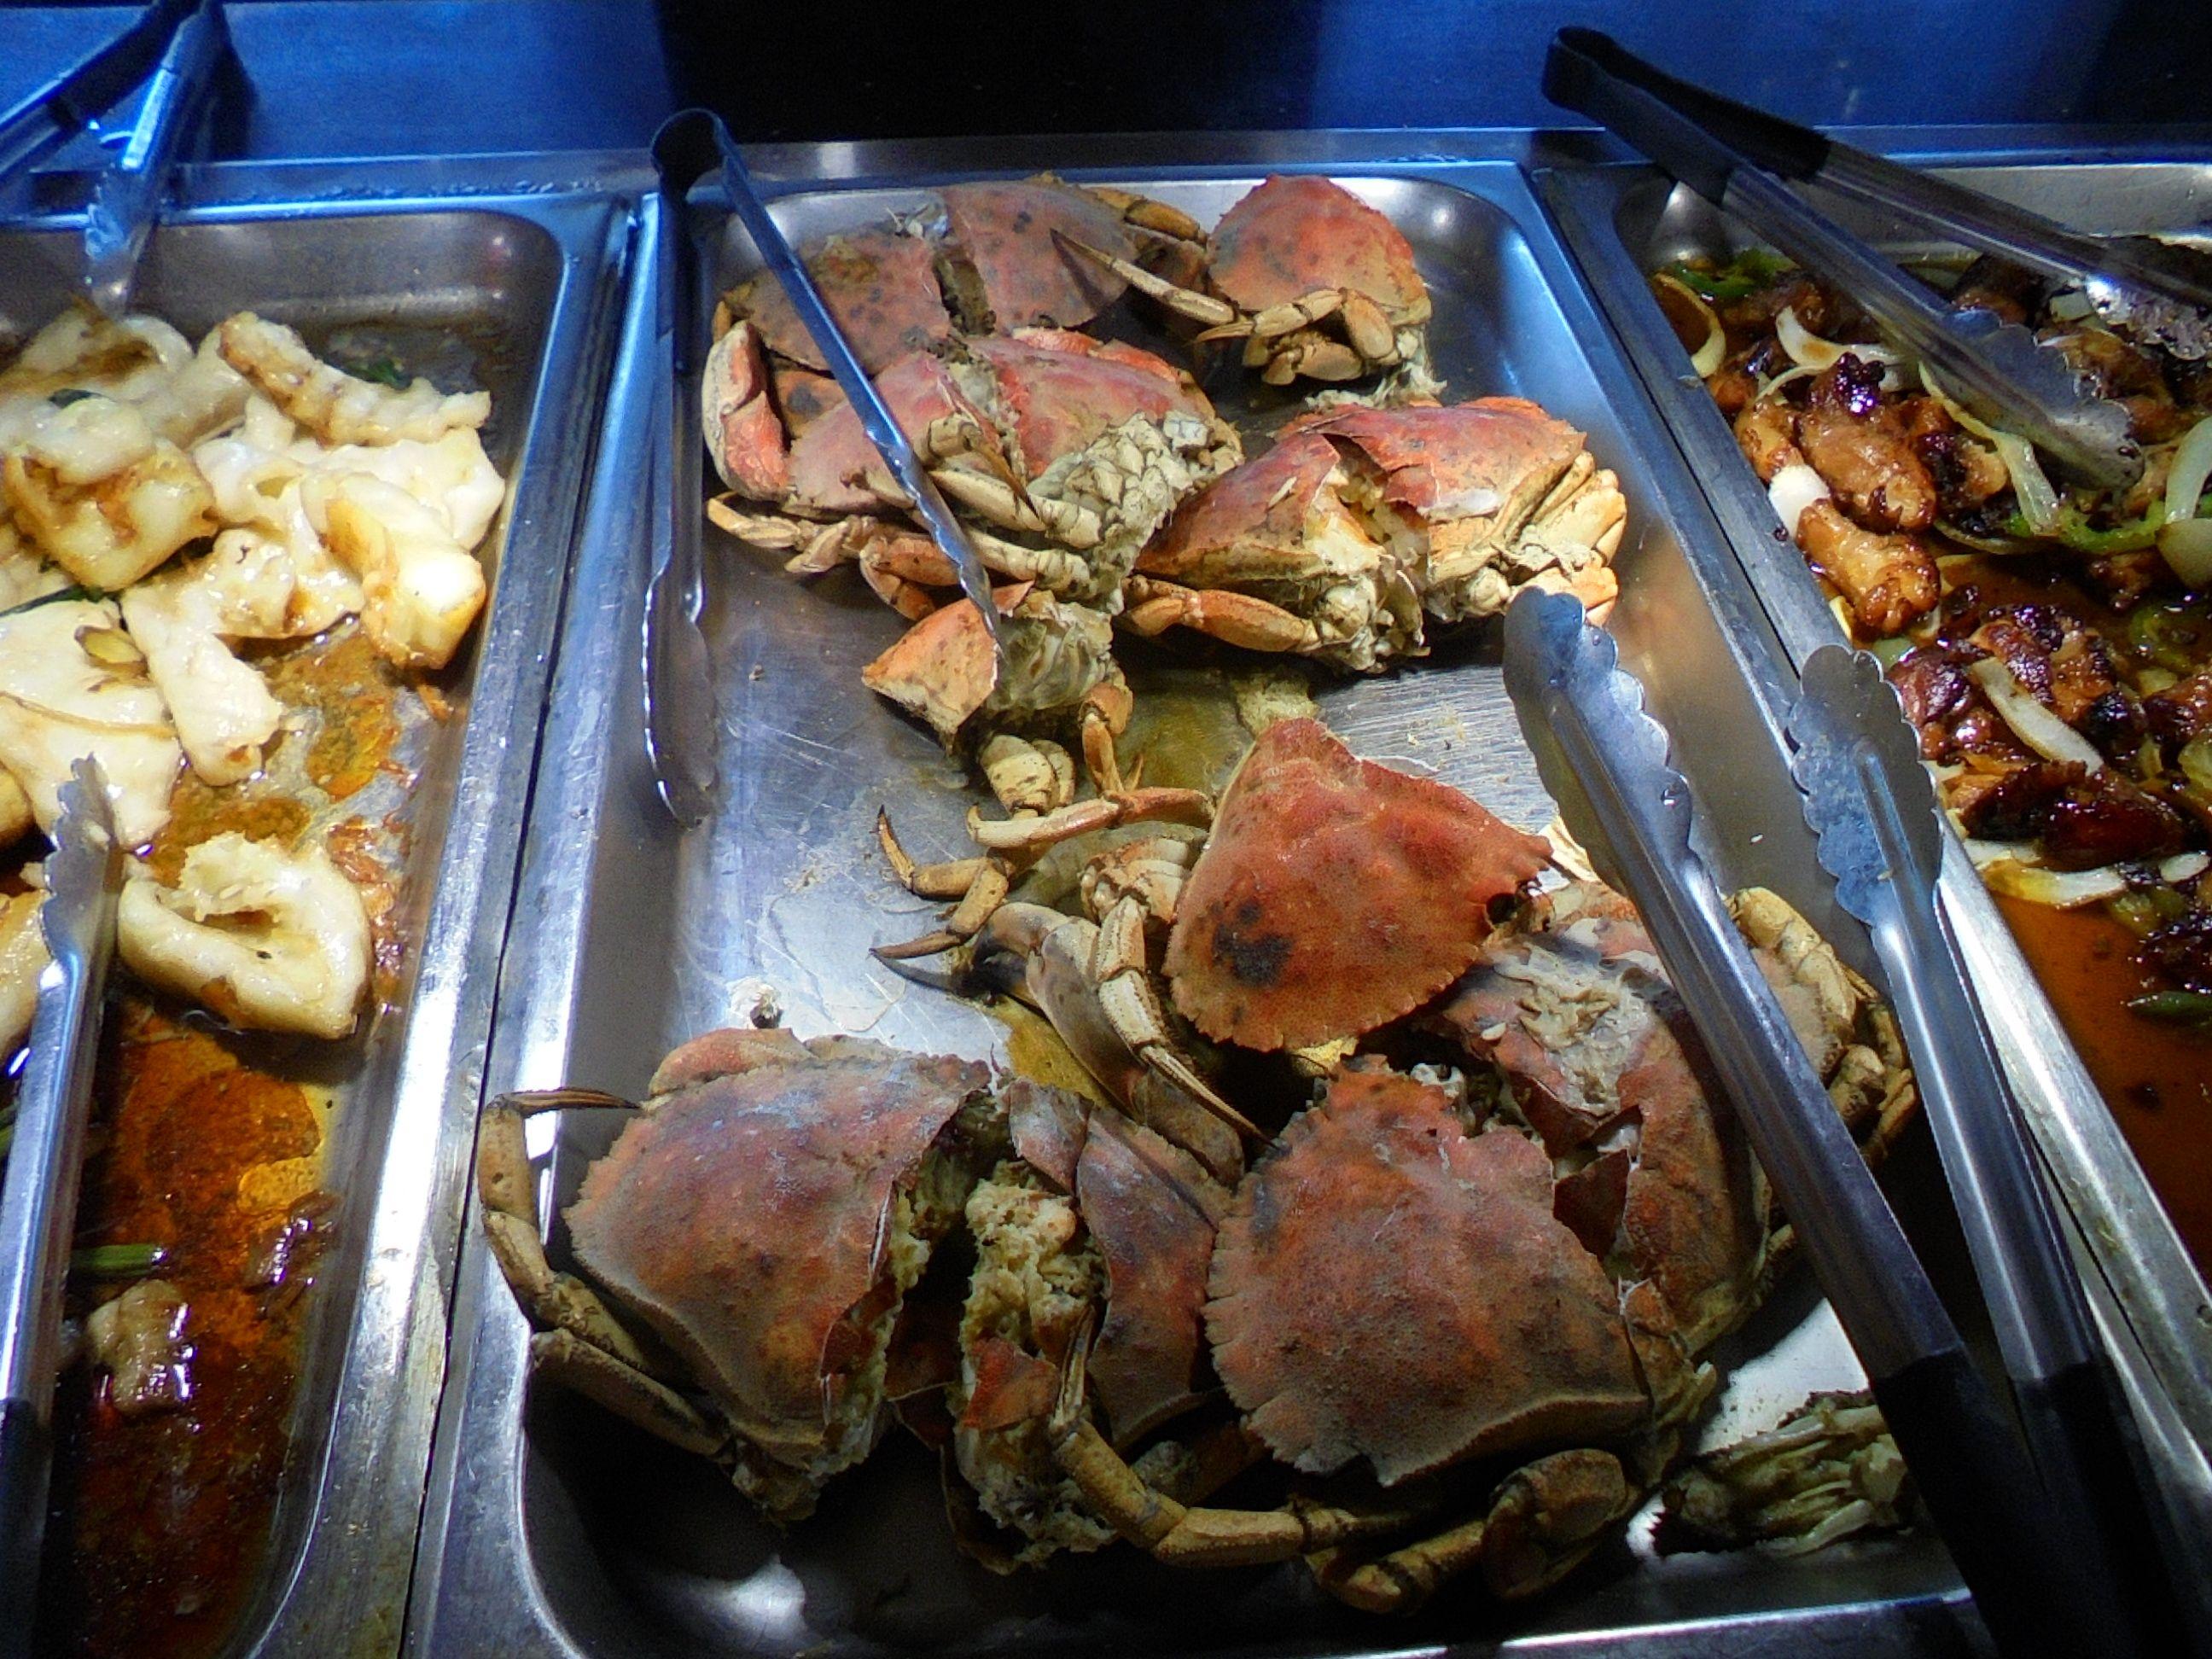 #delicious #Hibachi #cuisine @ #PanAsian #buffet #restauerant in #NorthEast #Philadelphia#Pennsylvania